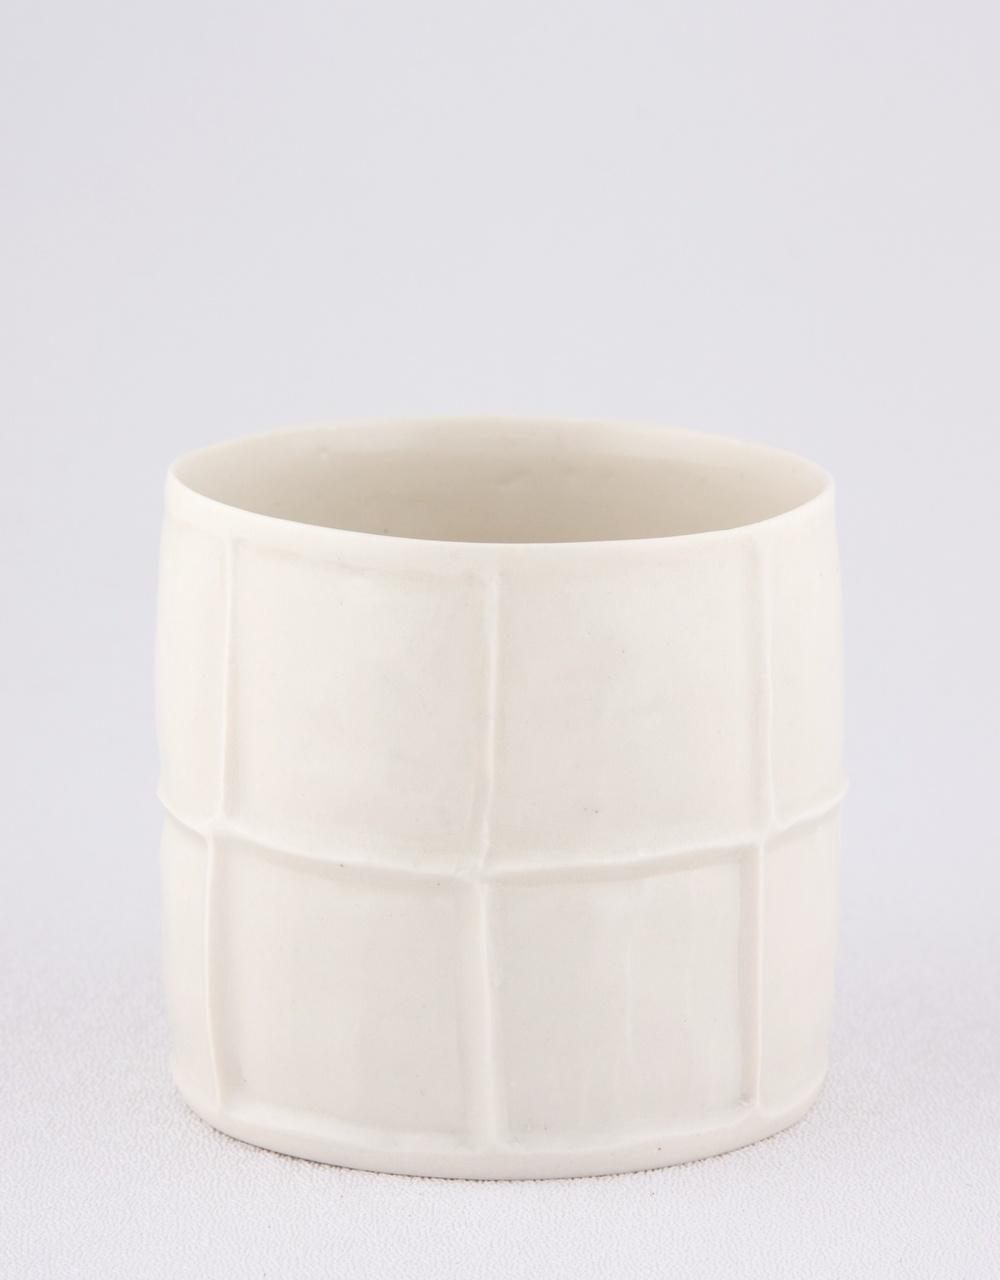 Shio Kusaka  Untitled (cup)  2009 Porcelain 2 ¾h x 3w in SK014